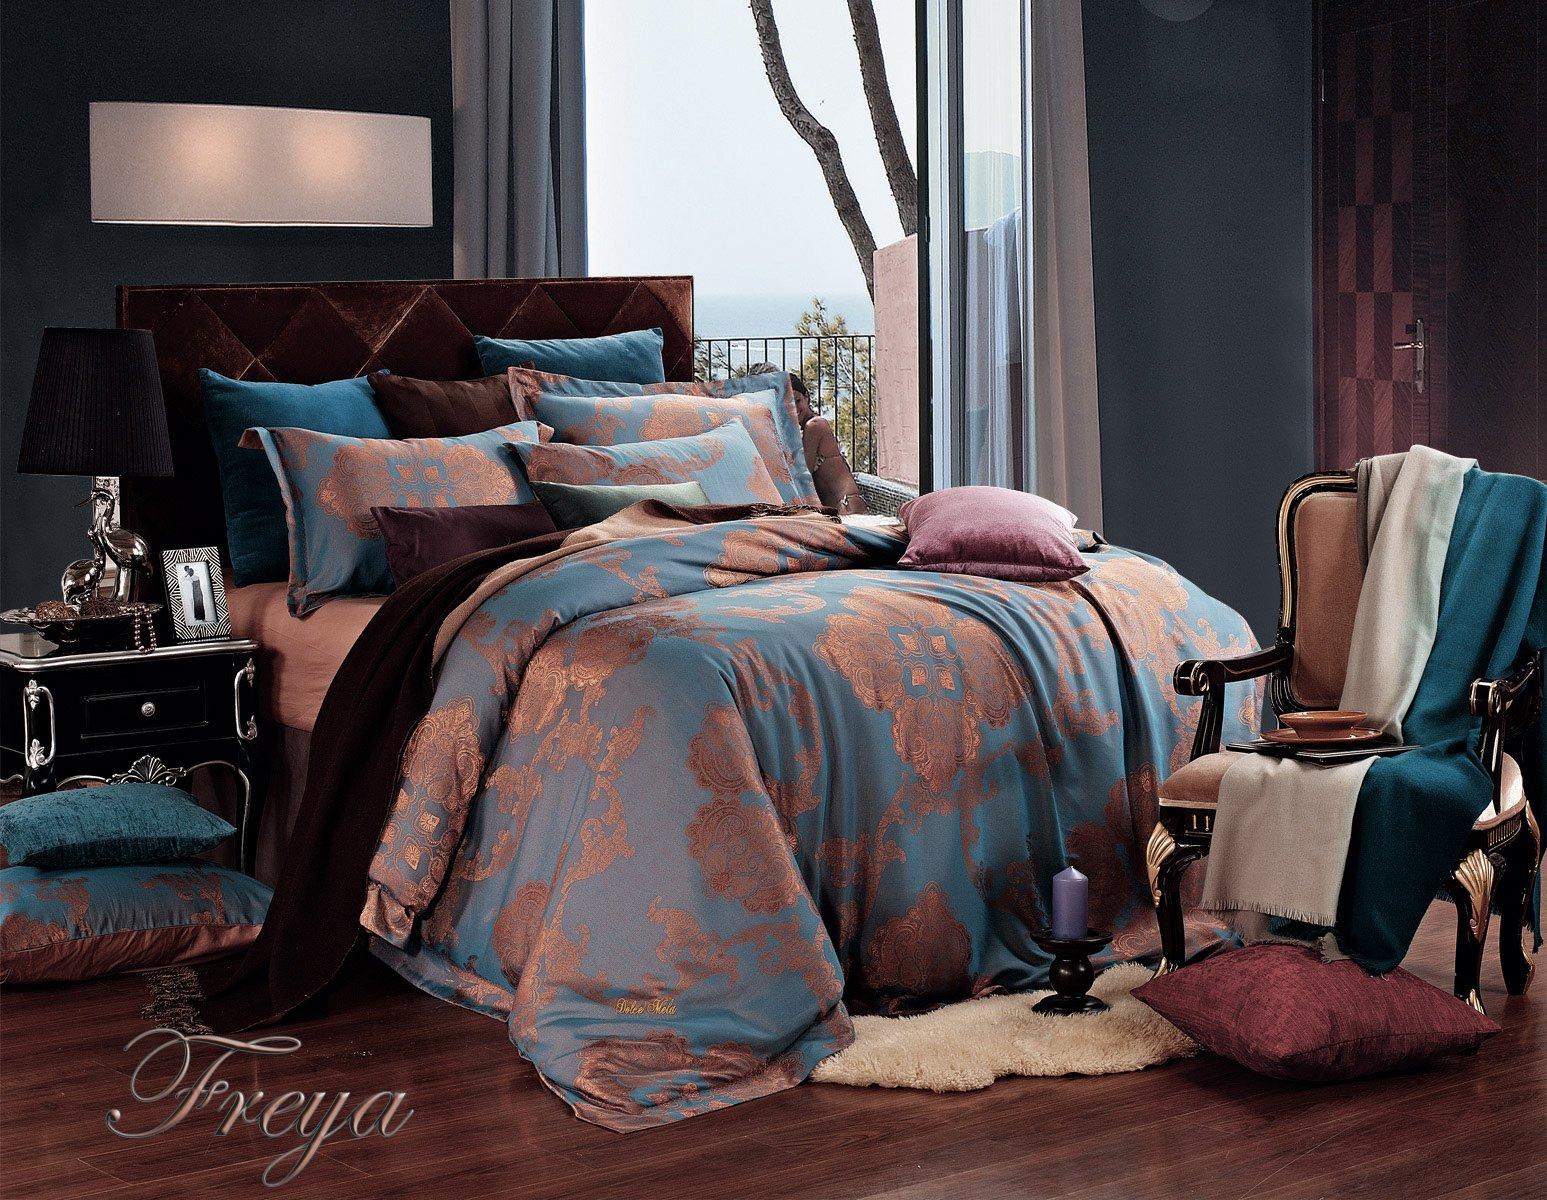 Freya by Dolce Mela 6PC King Size Duvet Cover Set Luxury Linen Bedding Set in Beautiful Gift Box